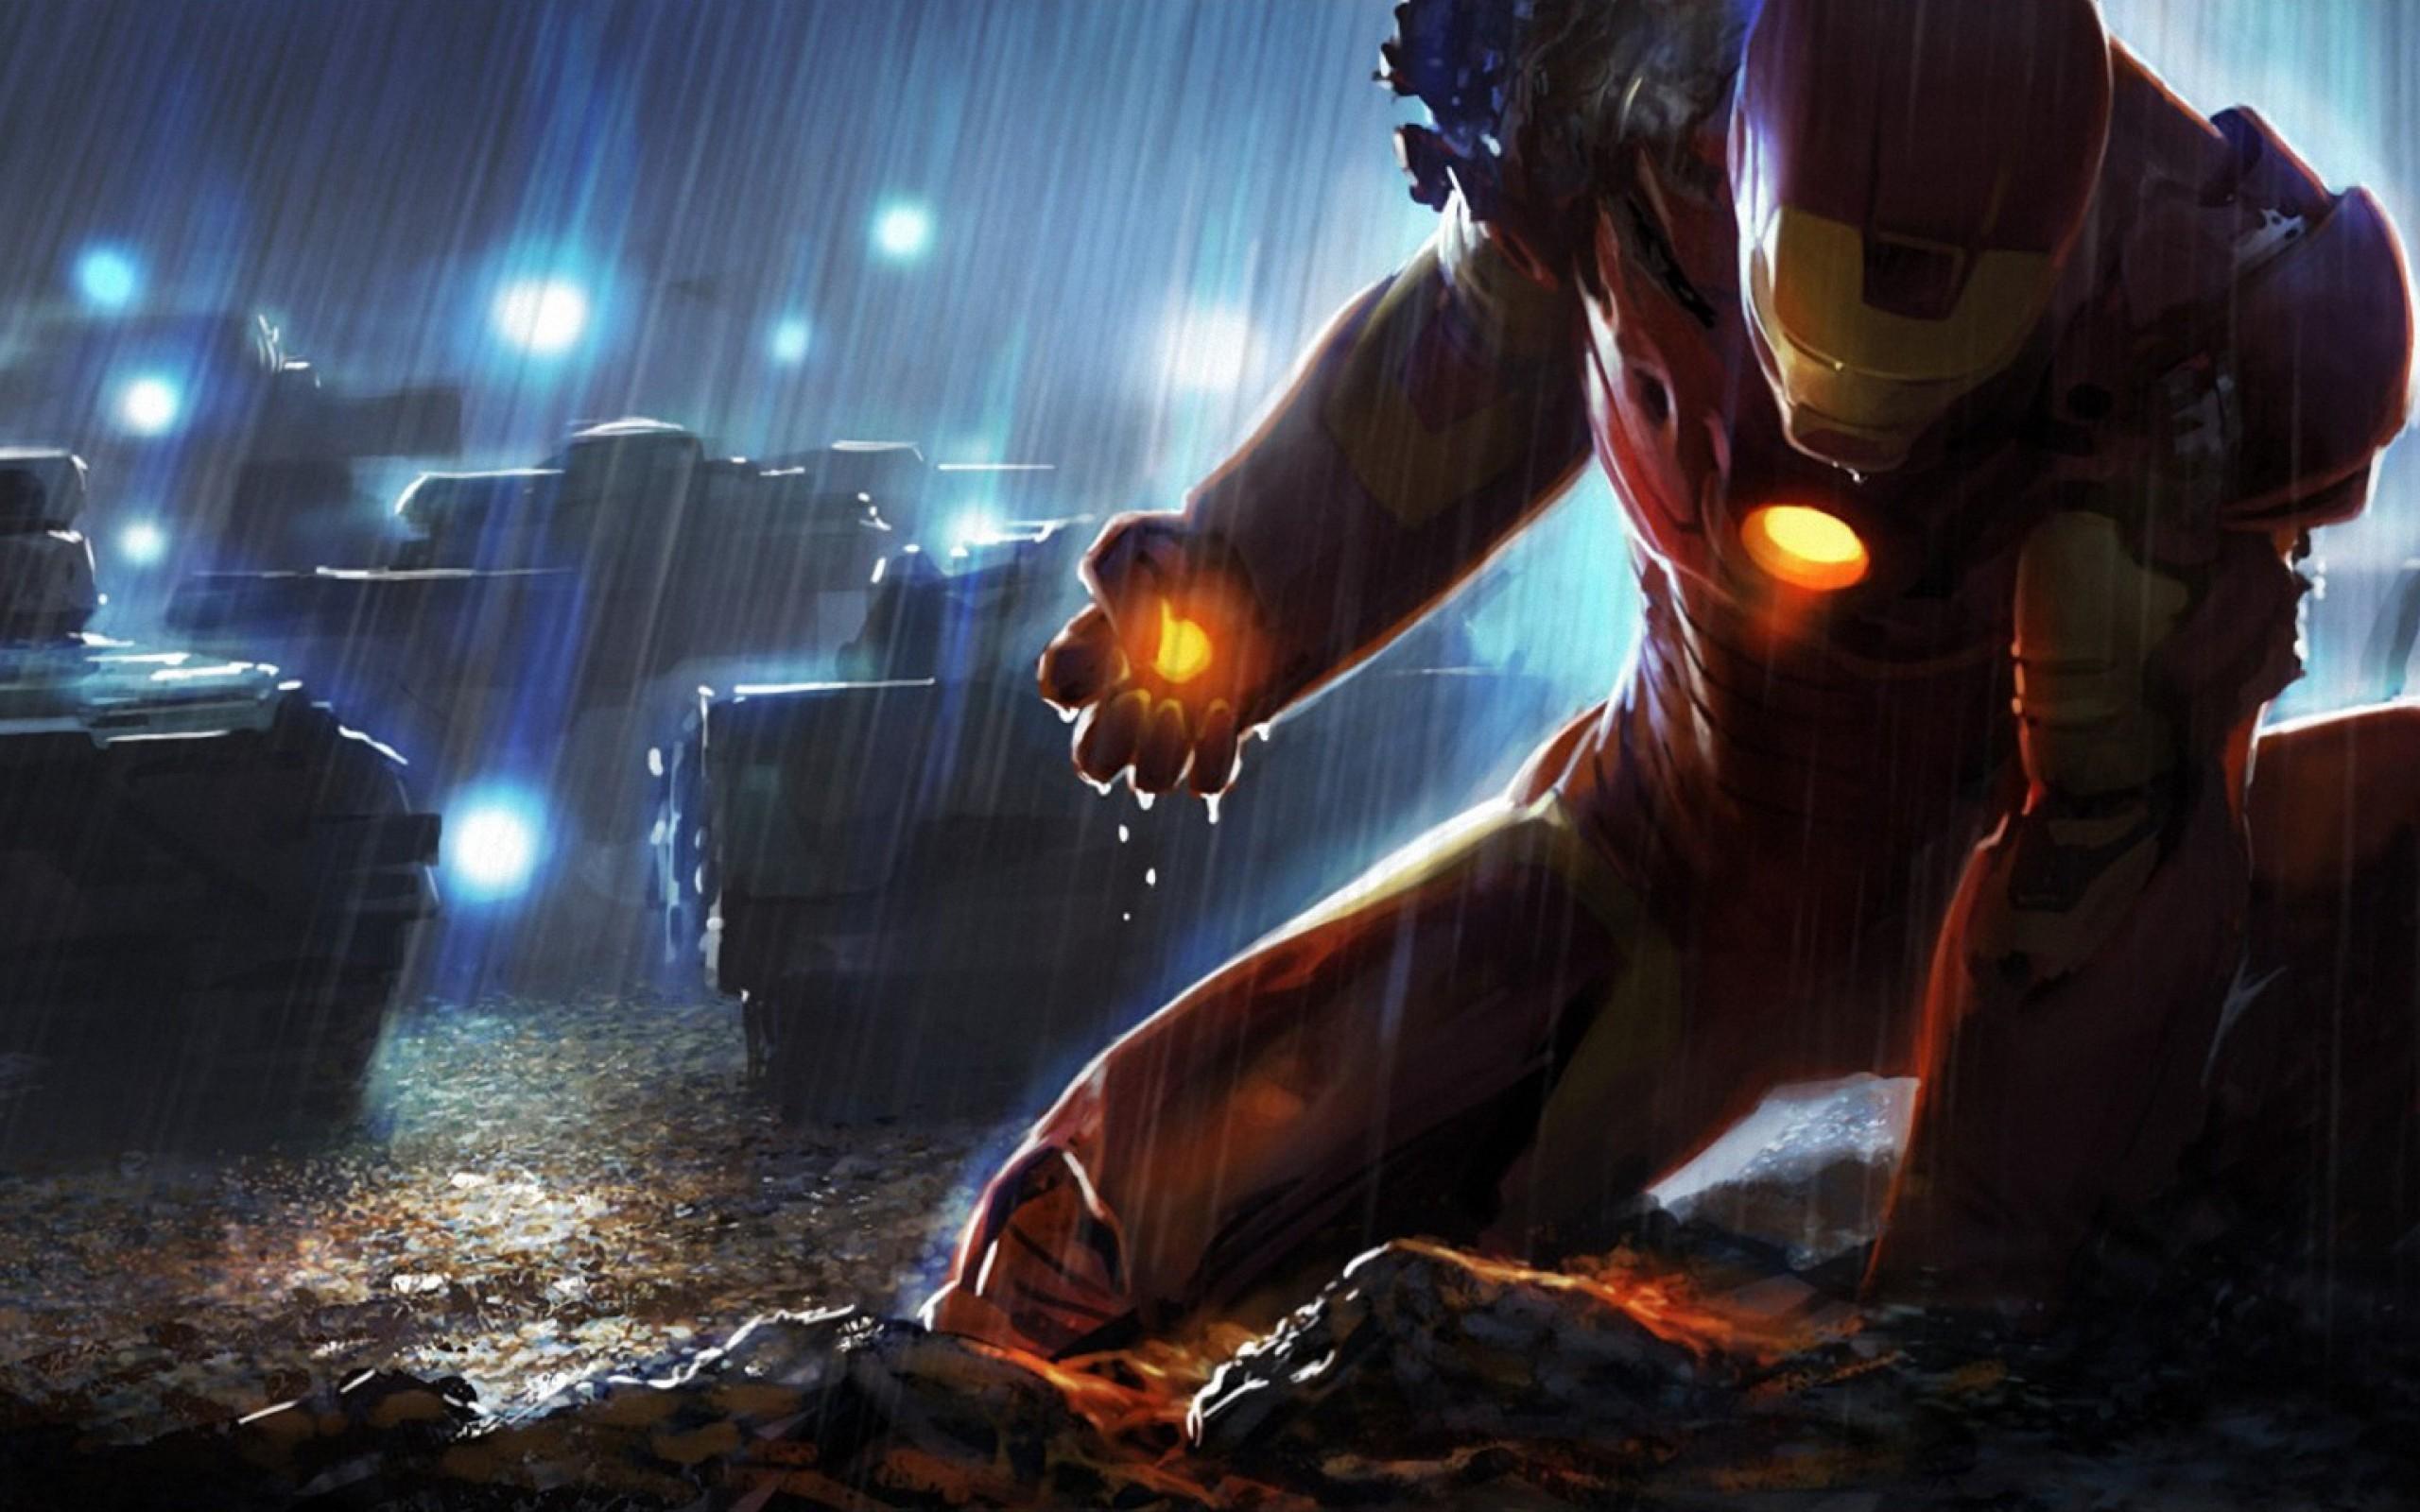 Iron Man Full Hd Wallpaper For Desktop And Mobiles 13